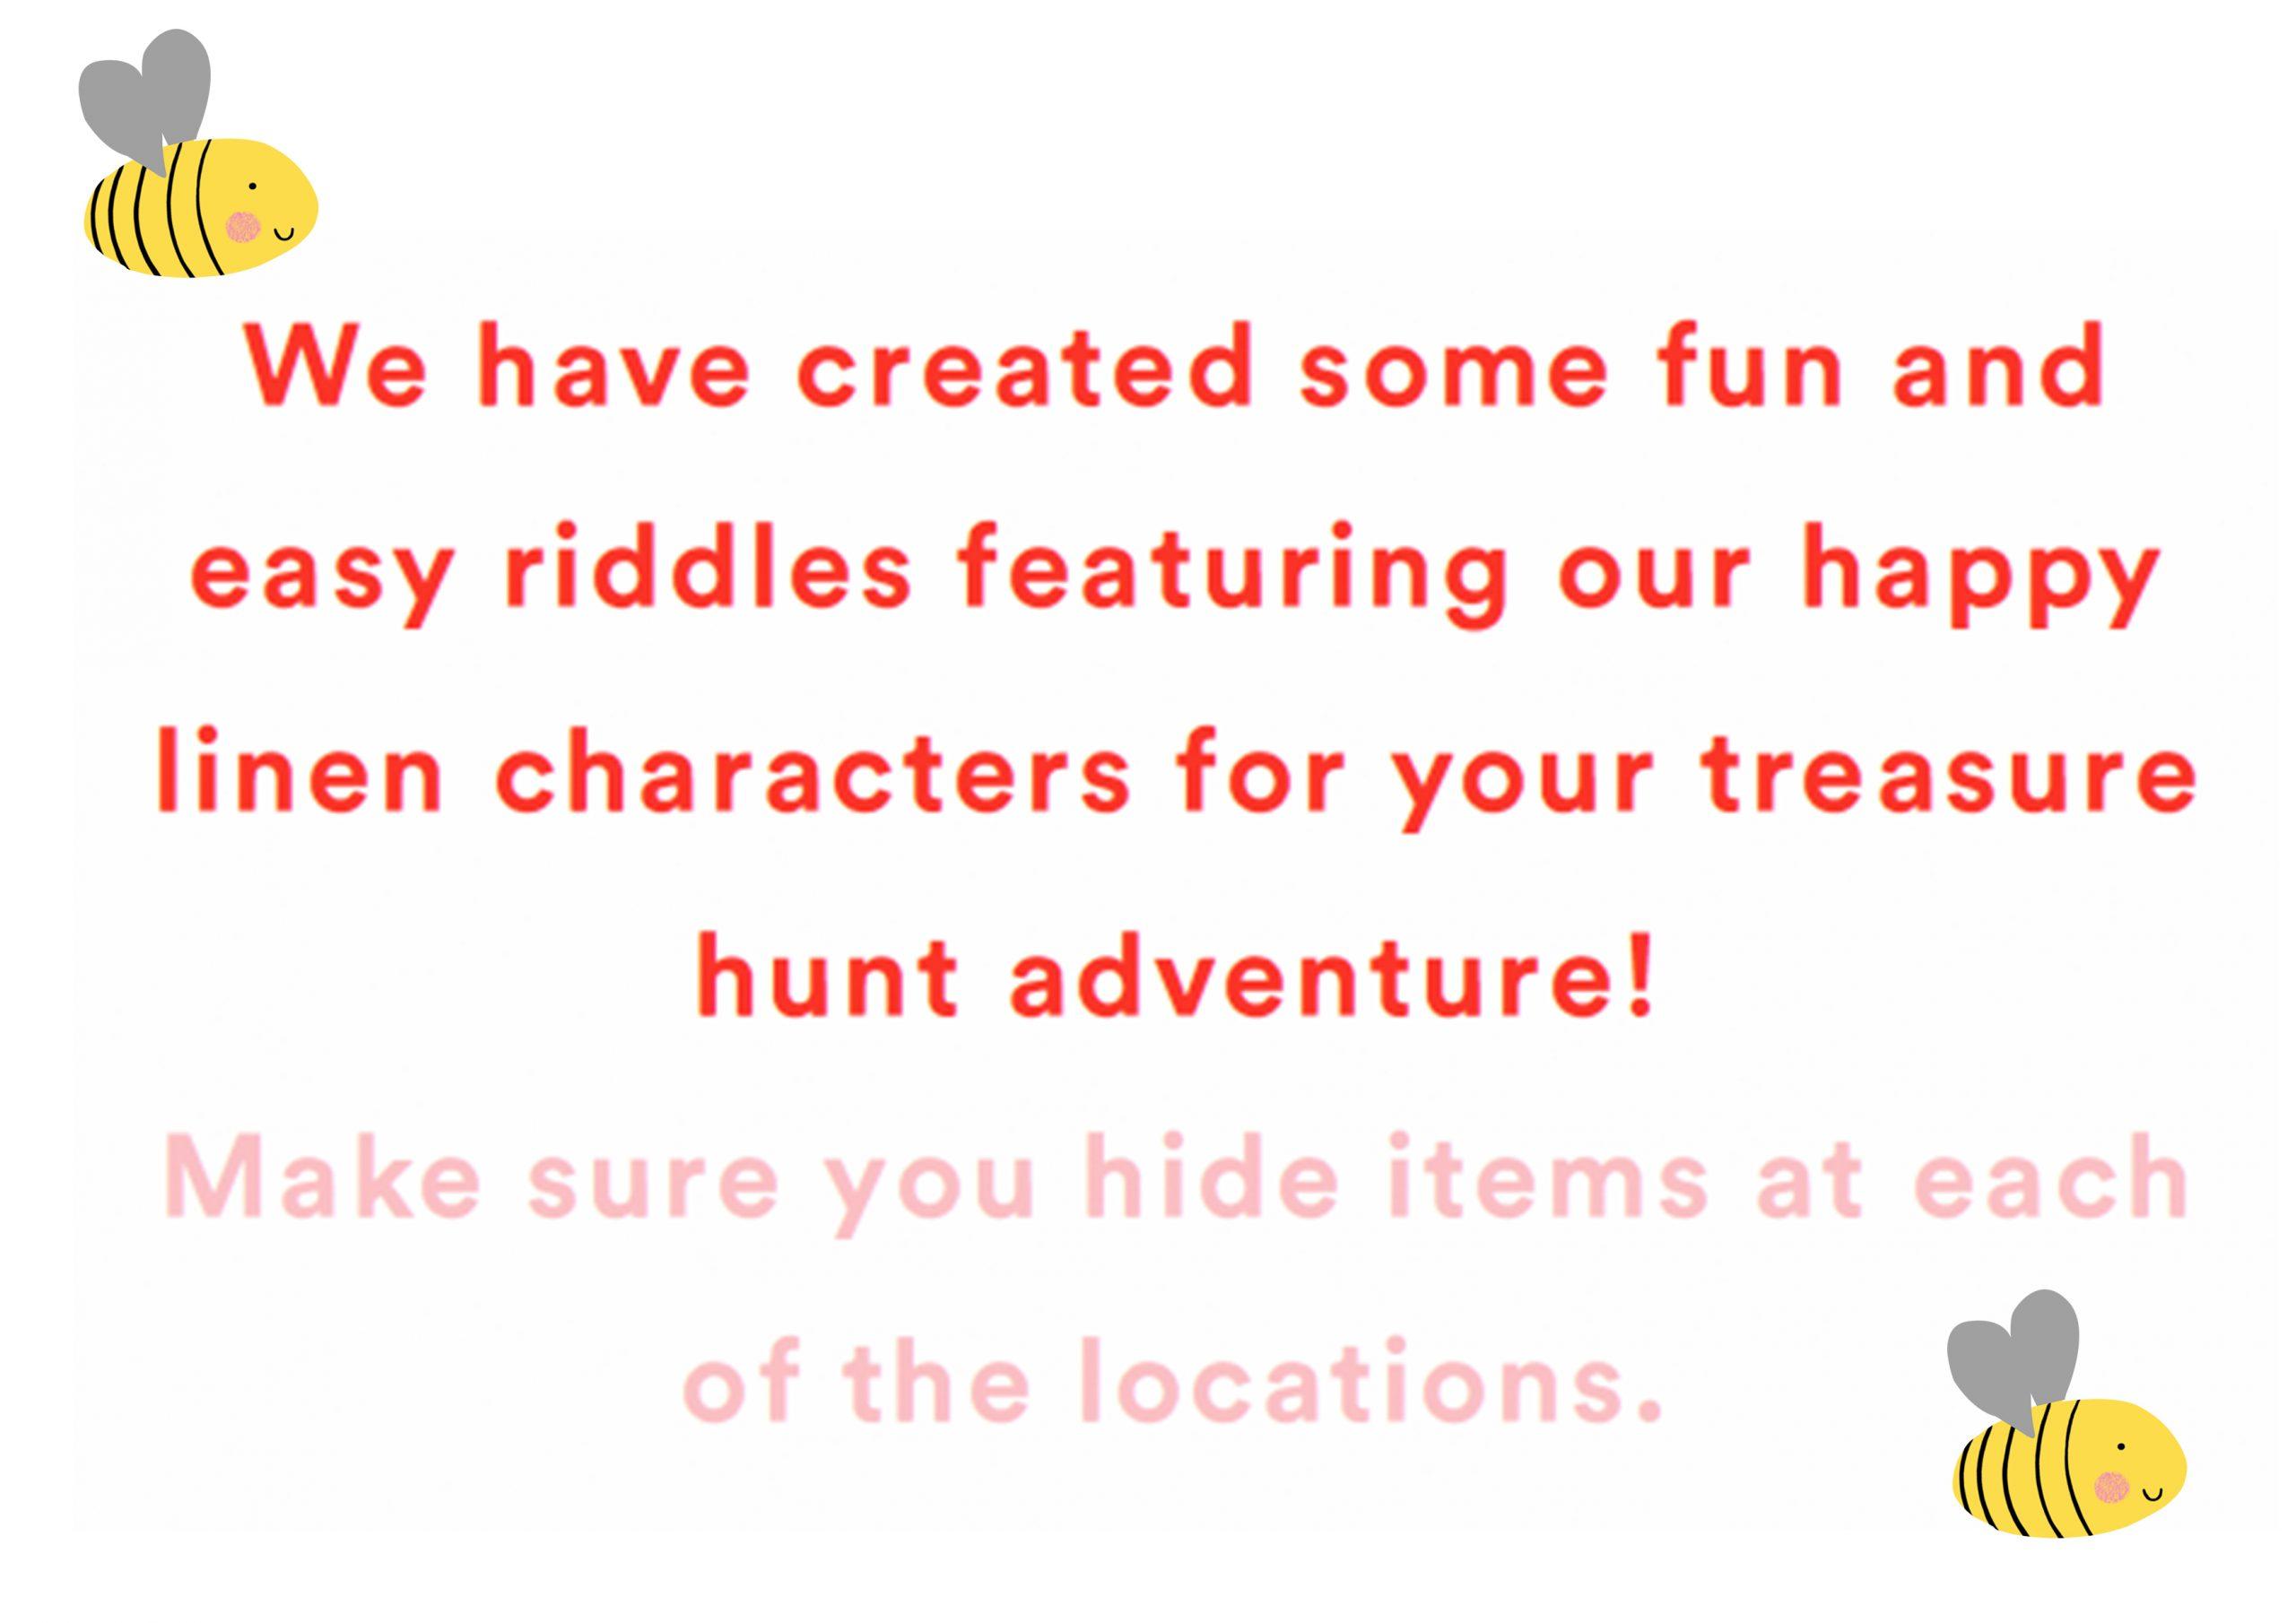 At home treasure hunt